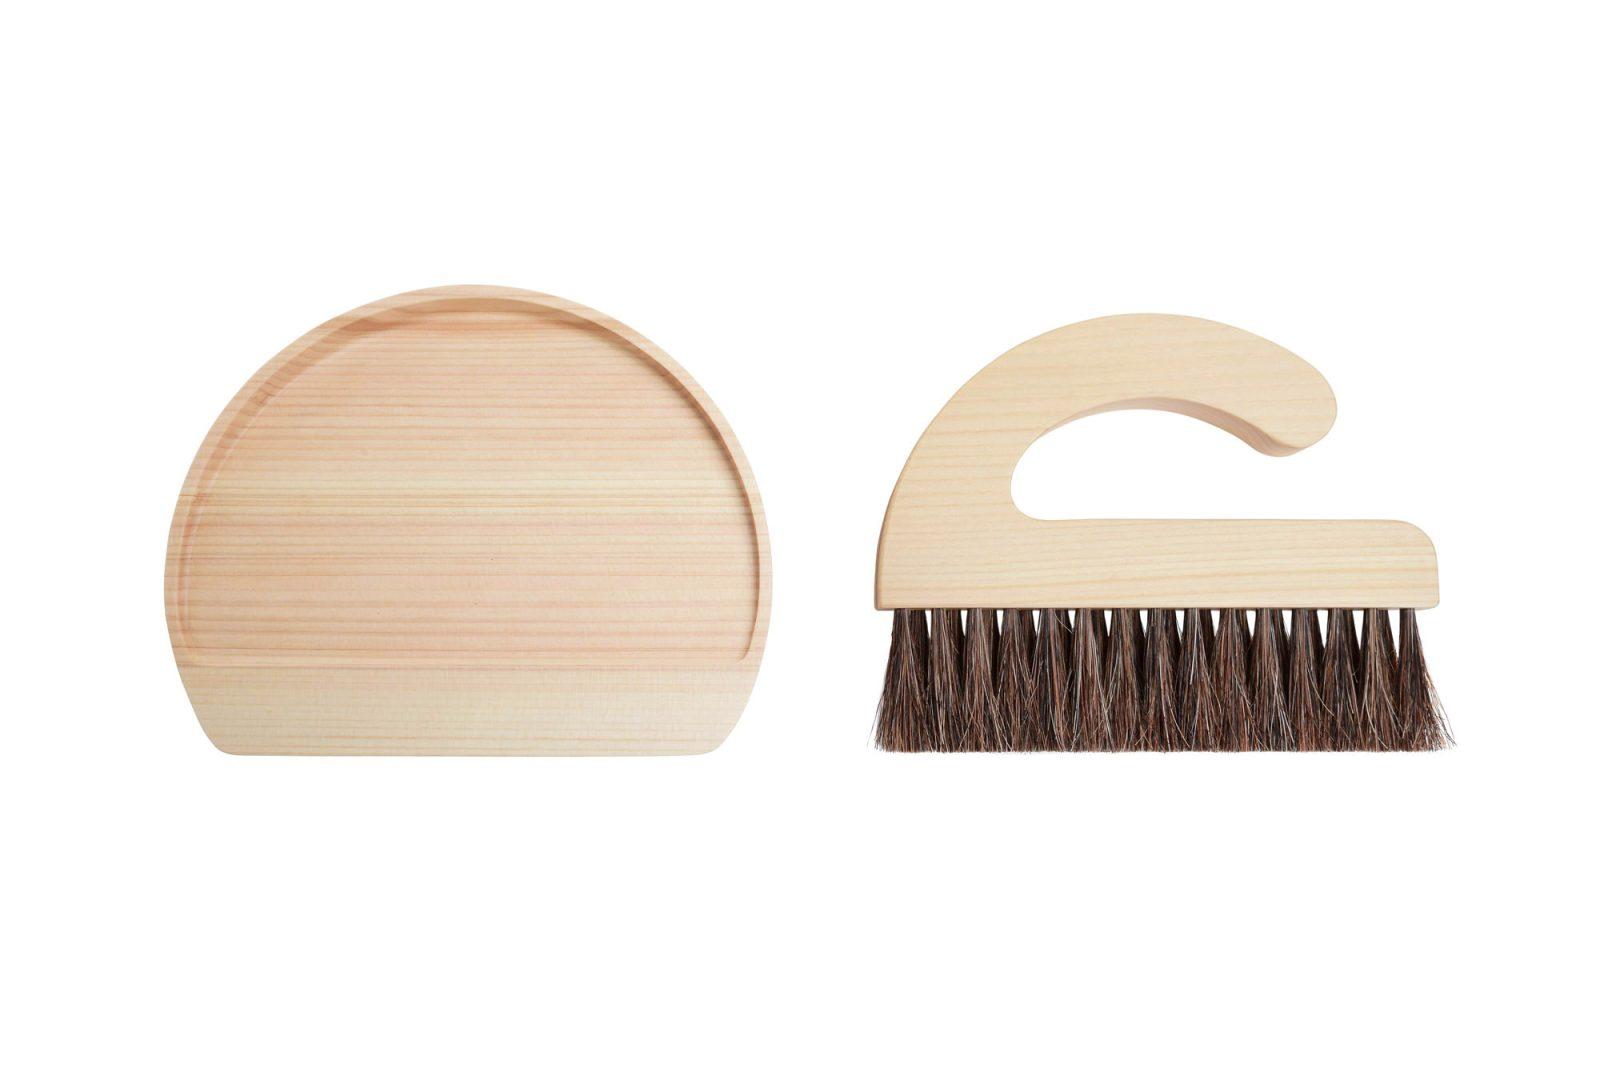 Asahineko Table Broom & Dust Pan by Makoto Koizumi-32833